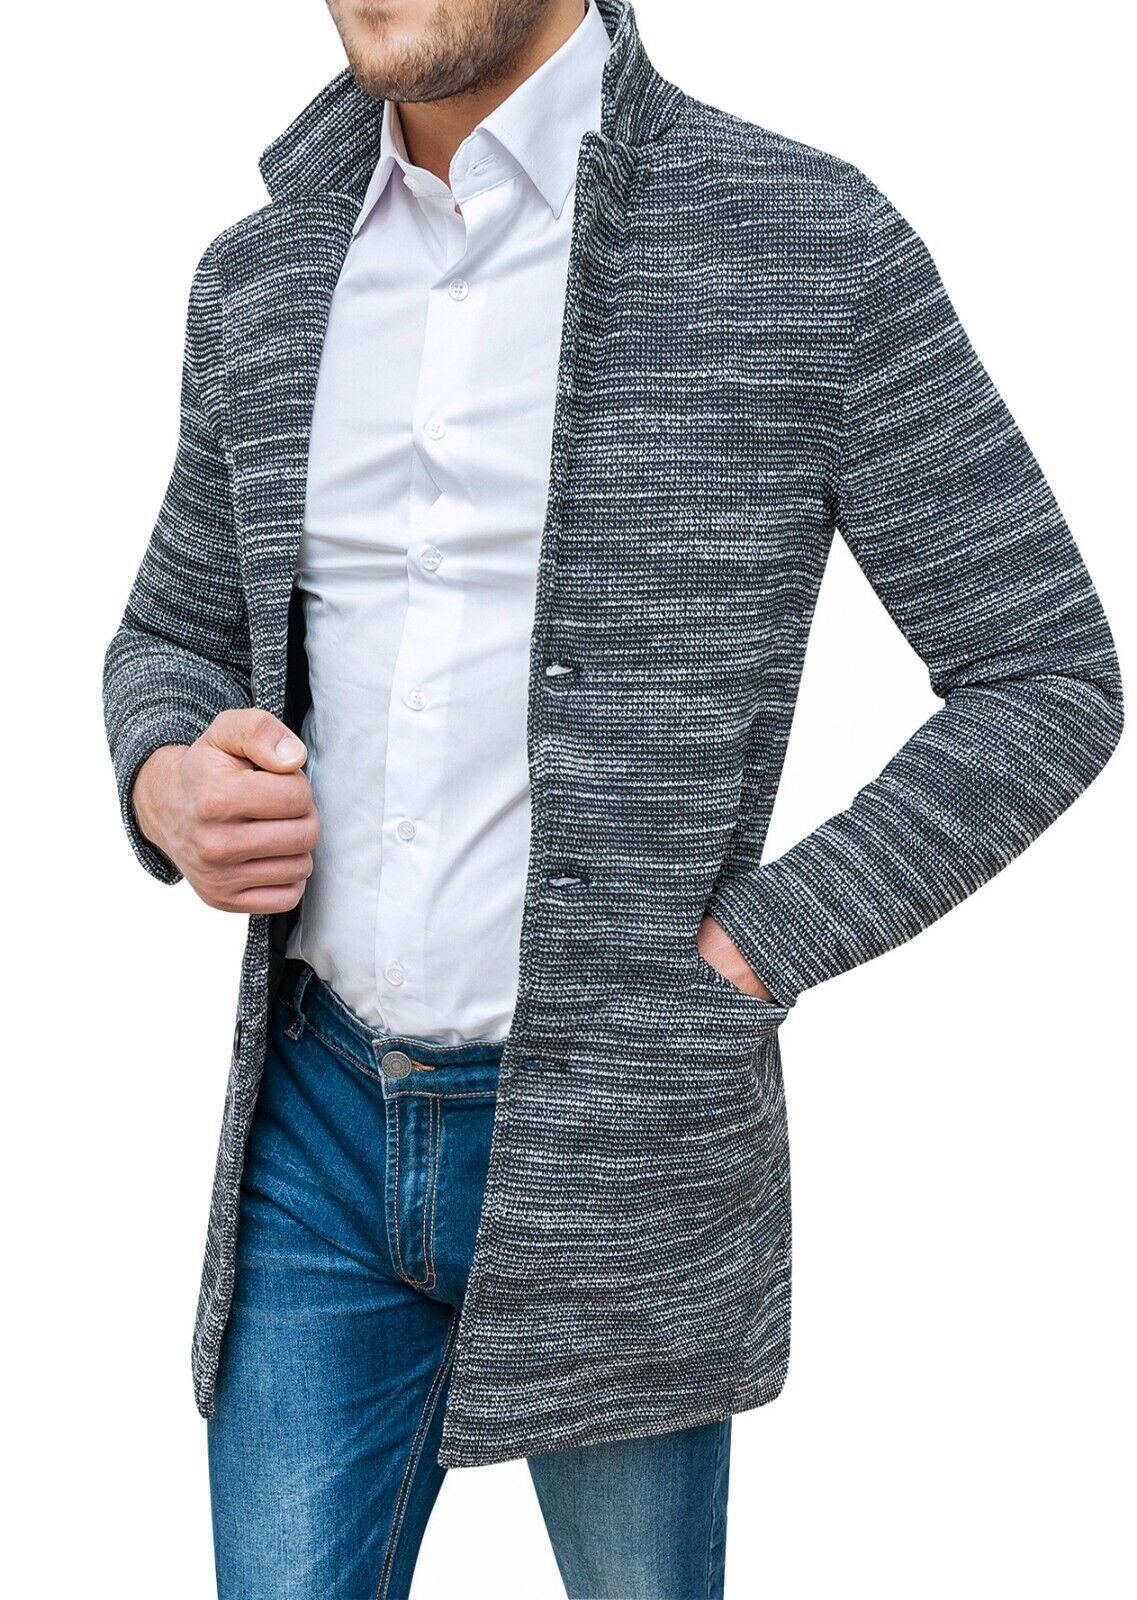 Mantel Mantel Herren Diamant Winter Grau Schwarz Slim Fit Elegant Tweed .